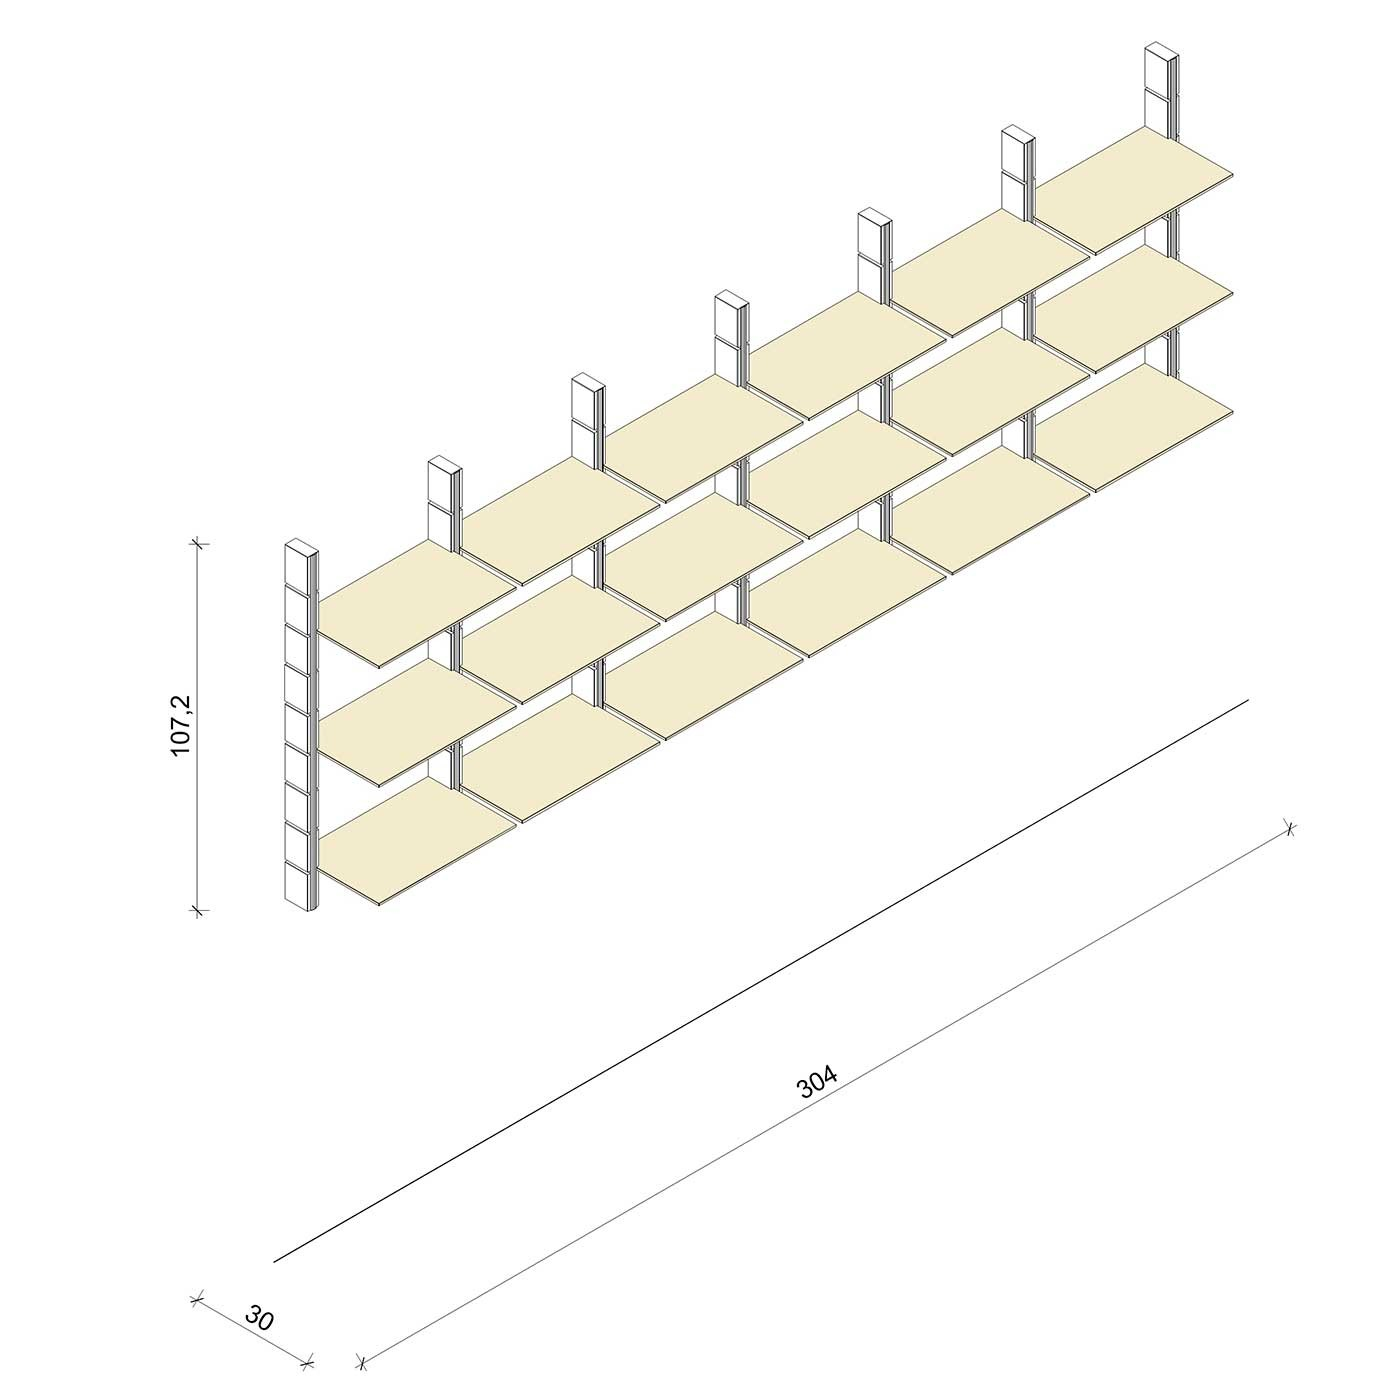 Bücherregal - Comfort (M) 304 - Maß: 304 x 107,2 x 30 cm (B x H x T)